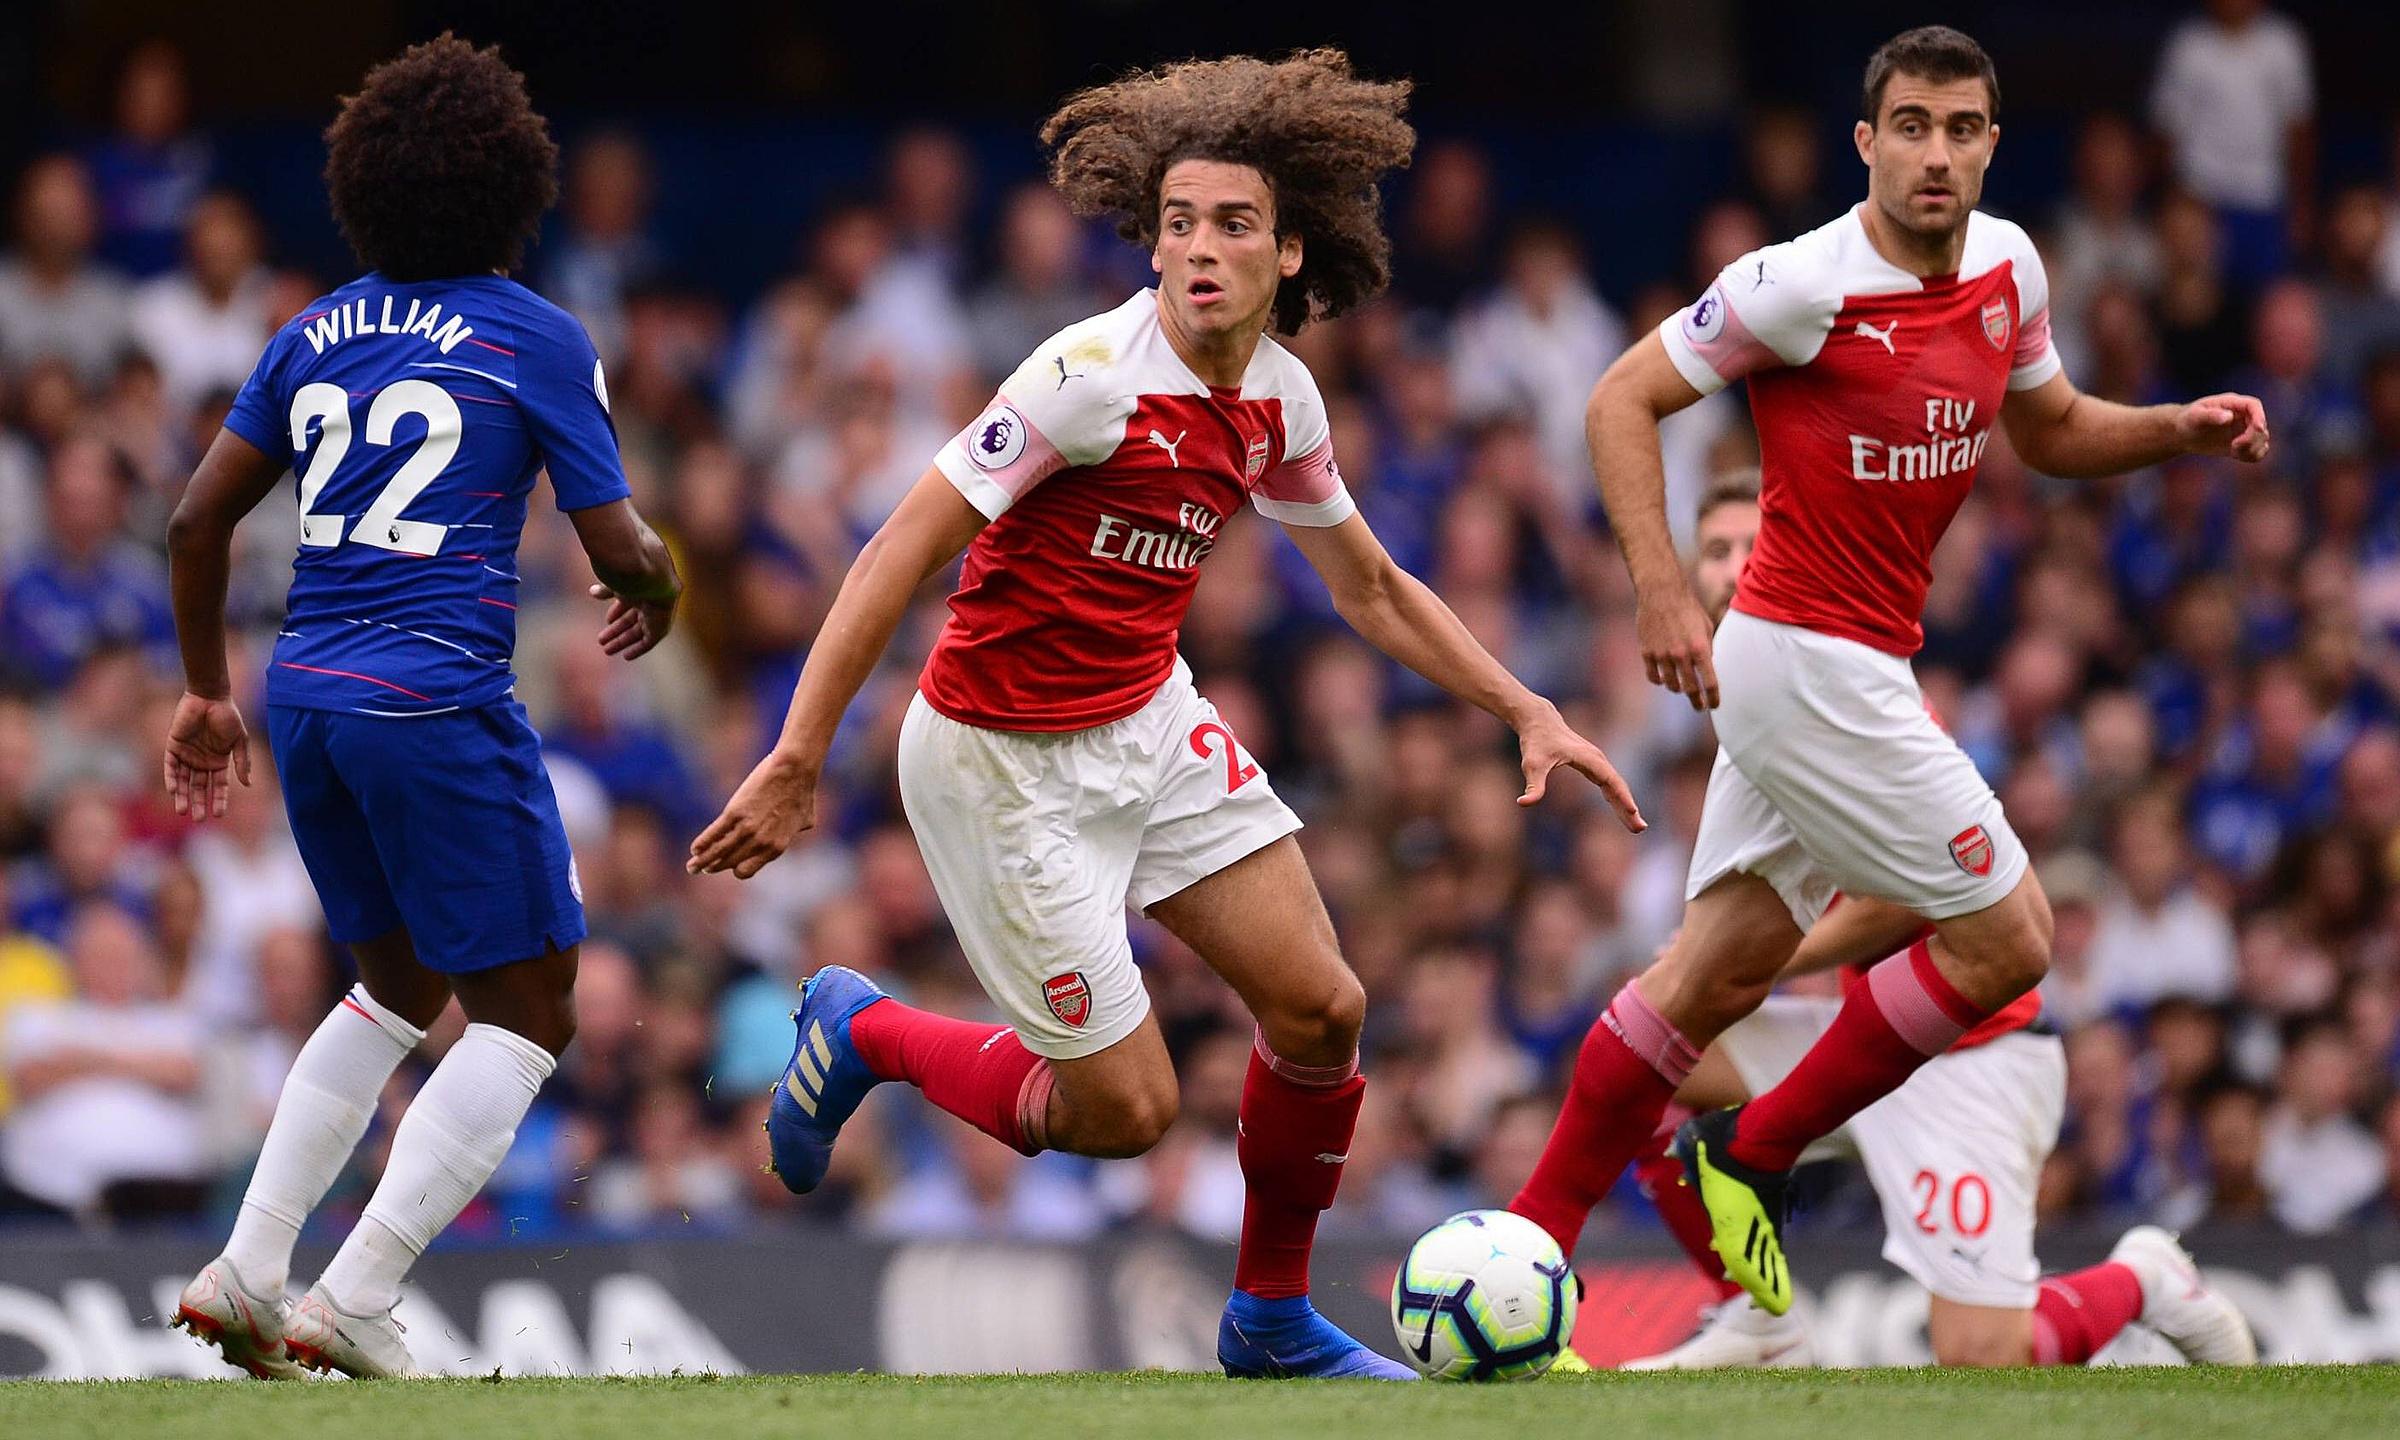 "Guendouzi ออกสตาร์ทได้อย่างน่าประทับใจที่ Arsenal โดยลงเล่น 48 นัดในทุกรายการ รวมถึง 33 นัดในพรีเมียร์ลีก  ภาพถ่าย: ""imago ."""